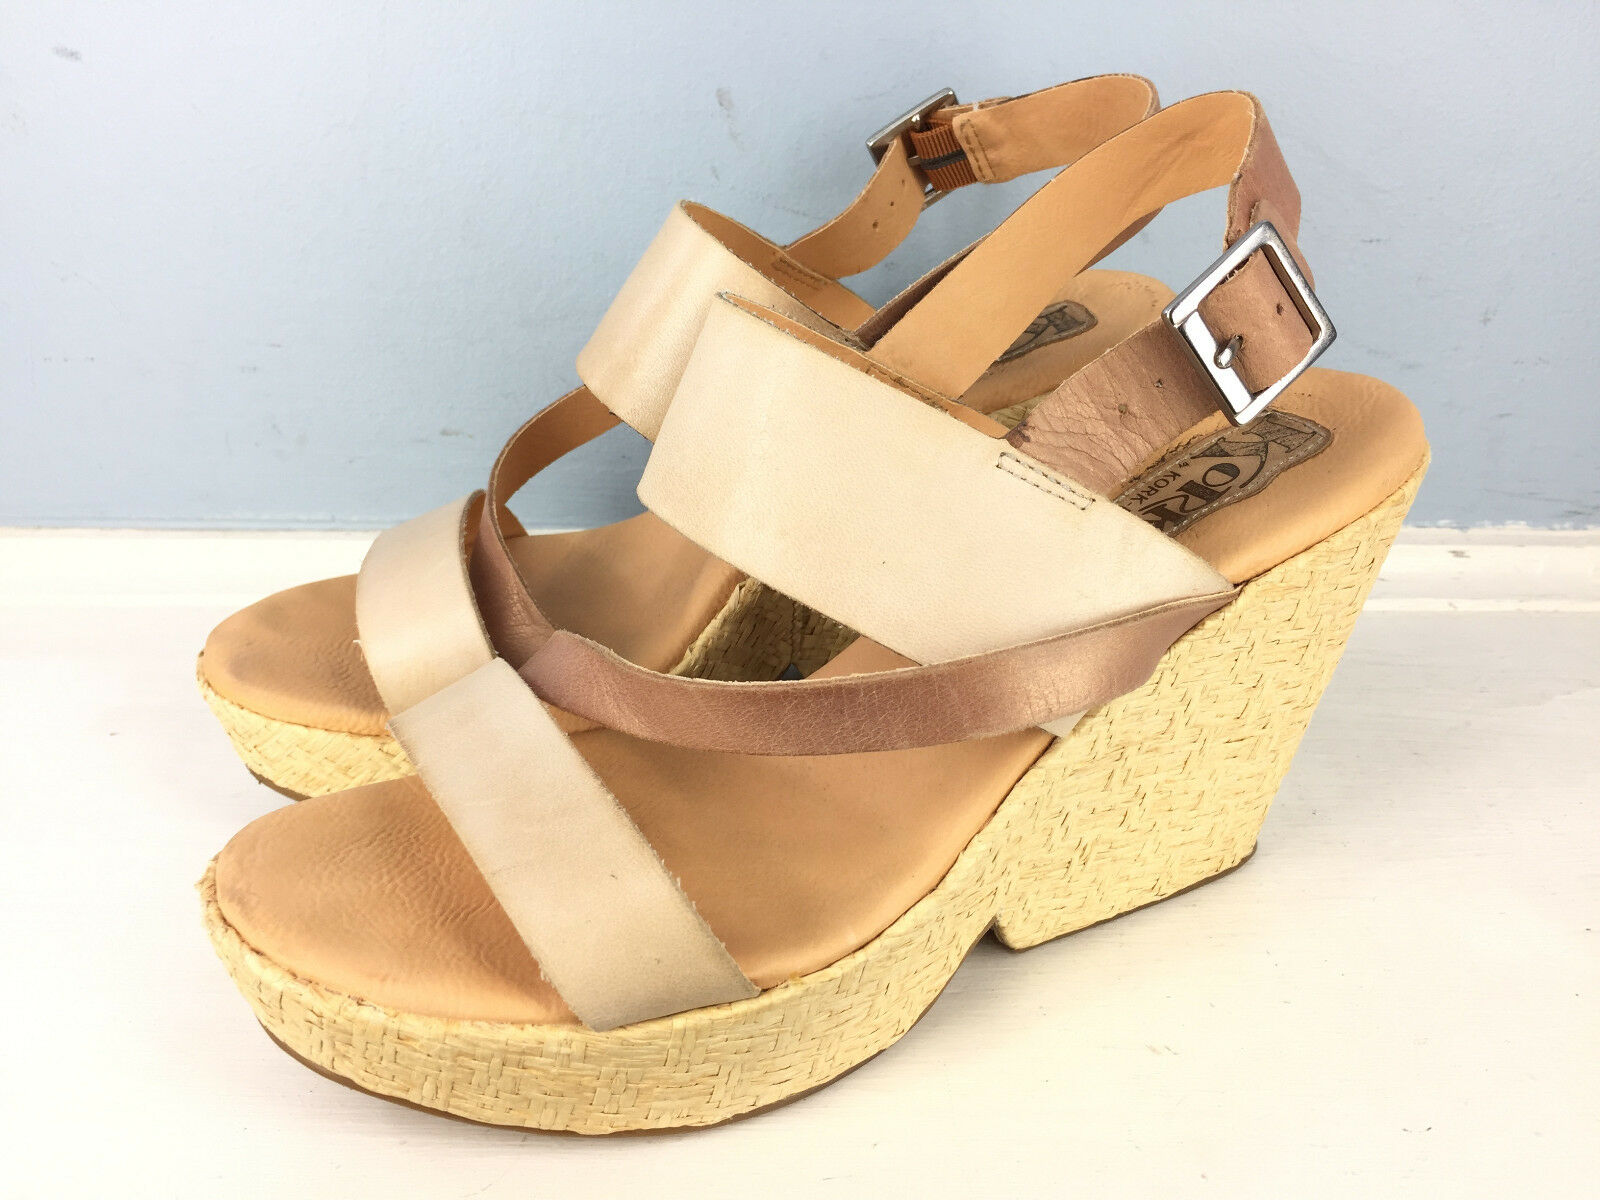 KORKS by Kork Ease 10   42 pink gold Beige Leather Wedge Heel Sandals EUC CUTE